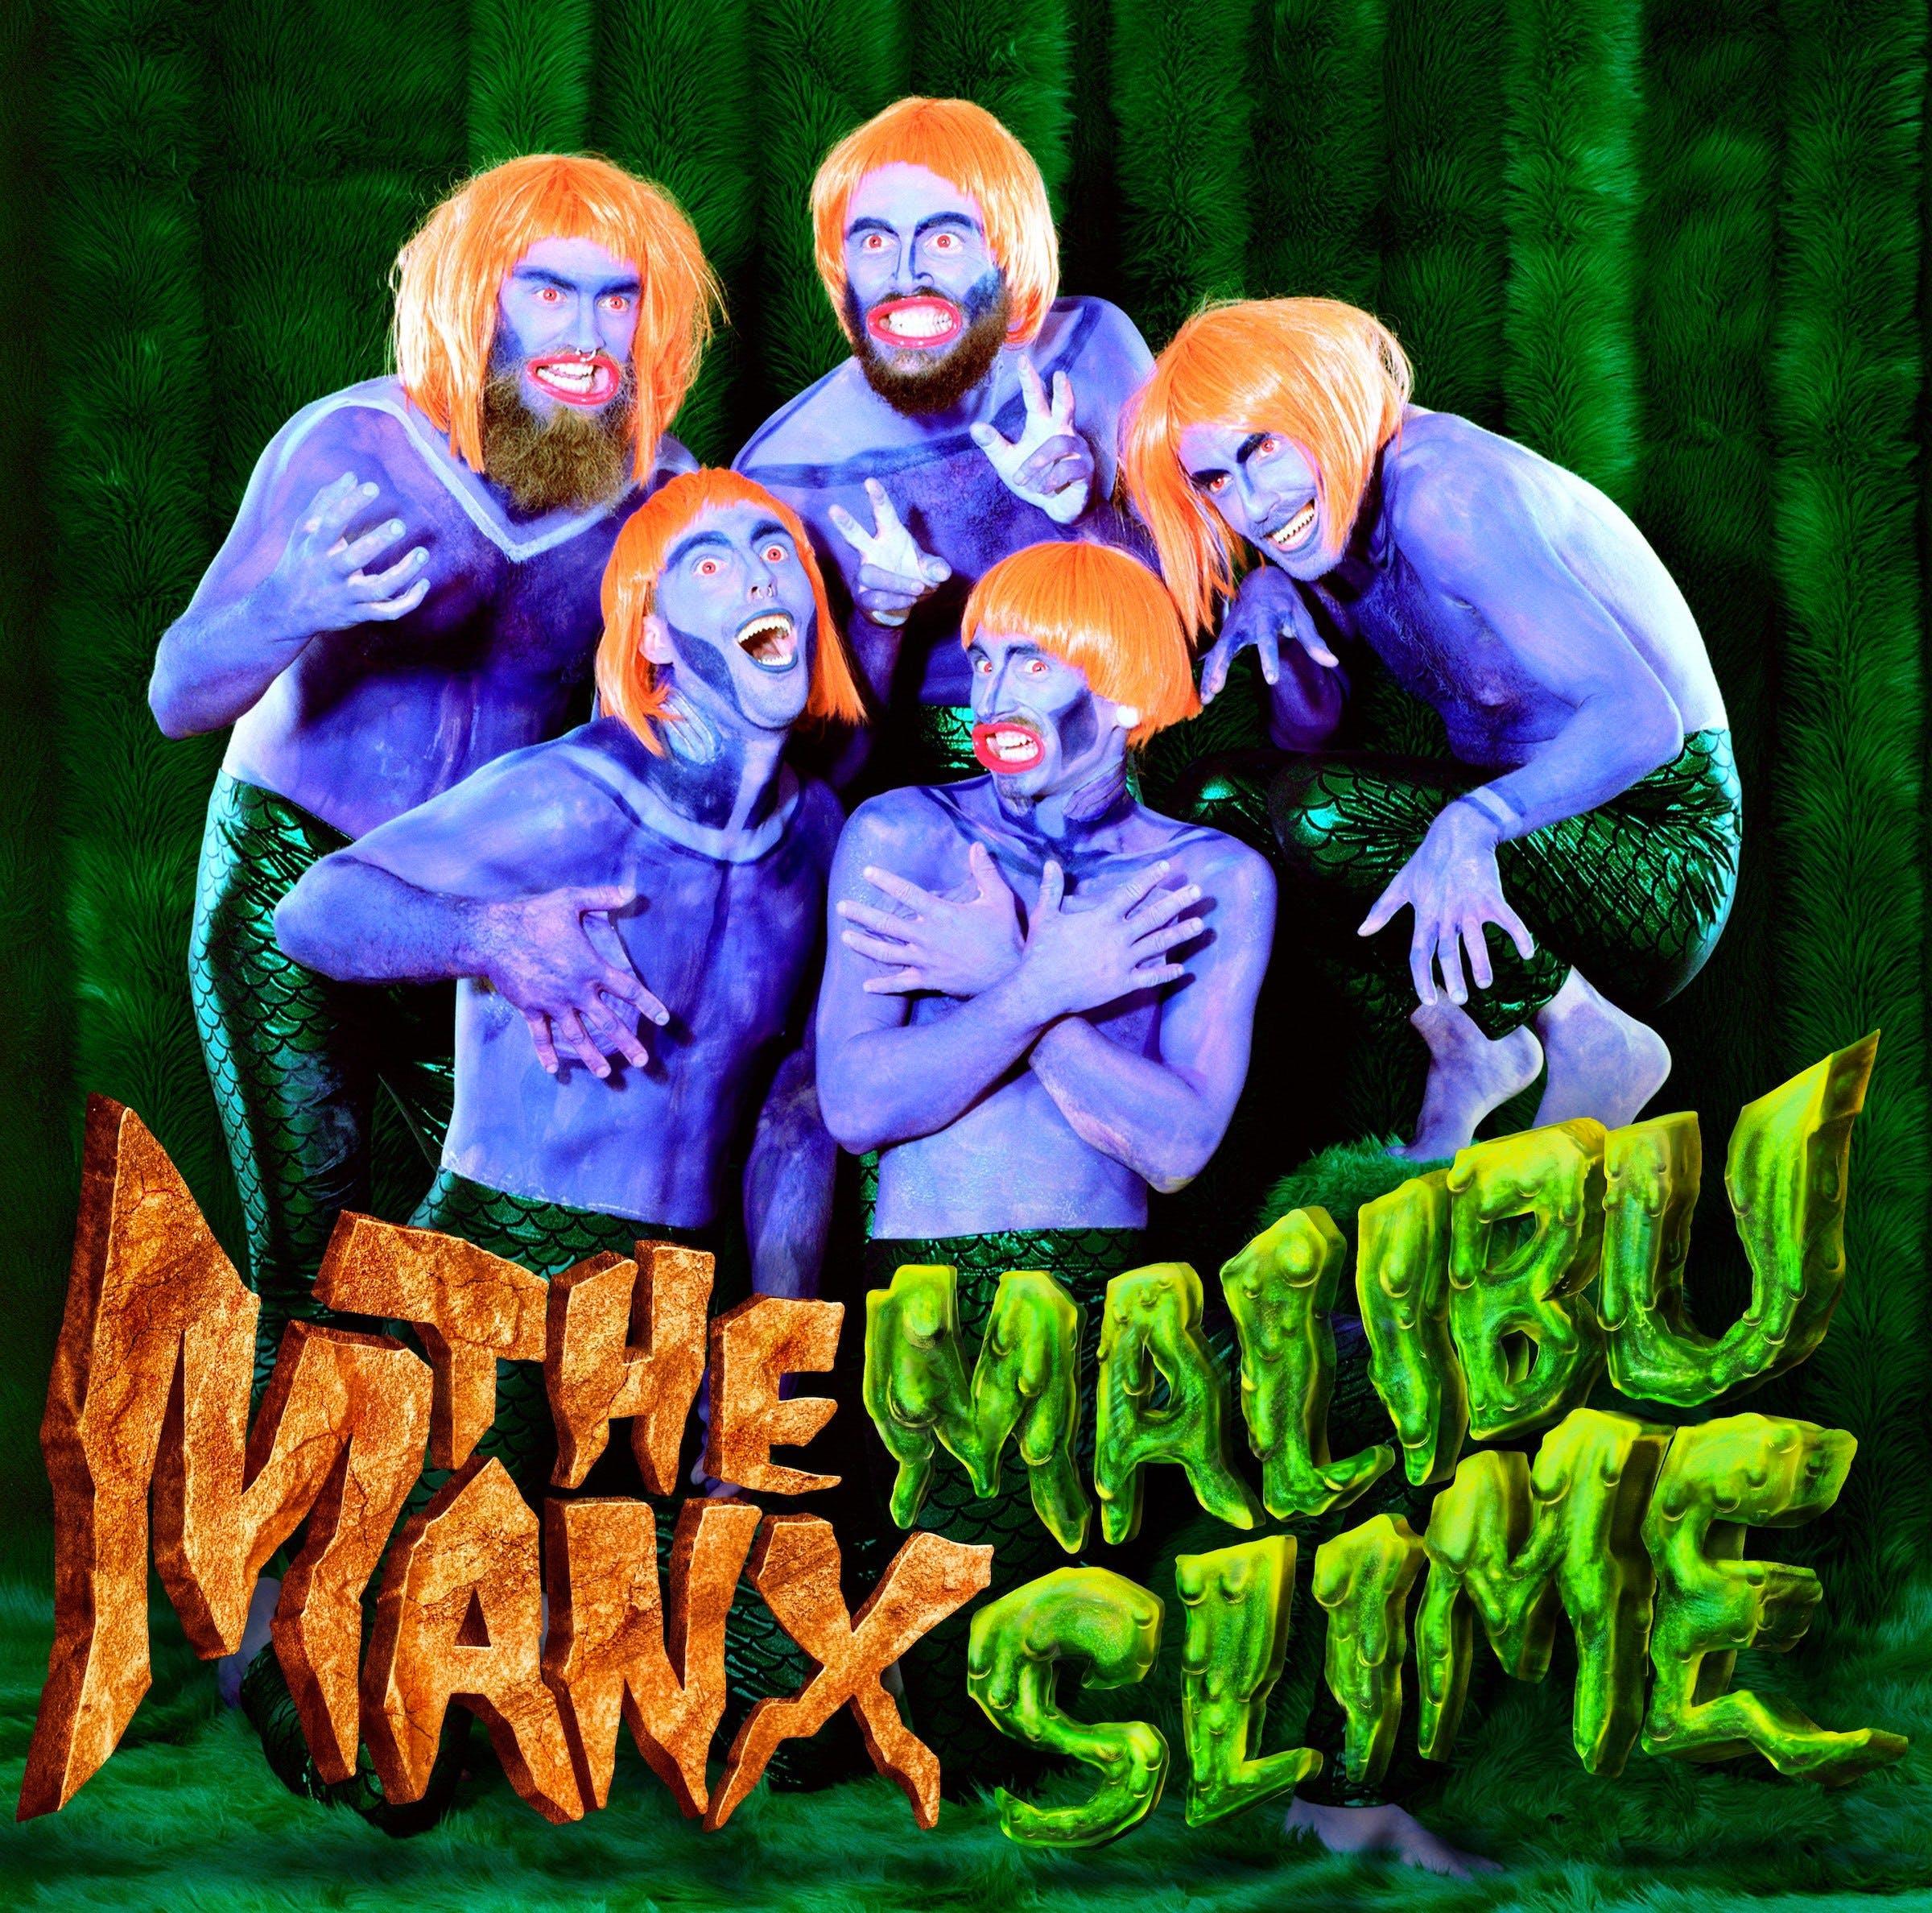 The Manx Malibu Slime Cover